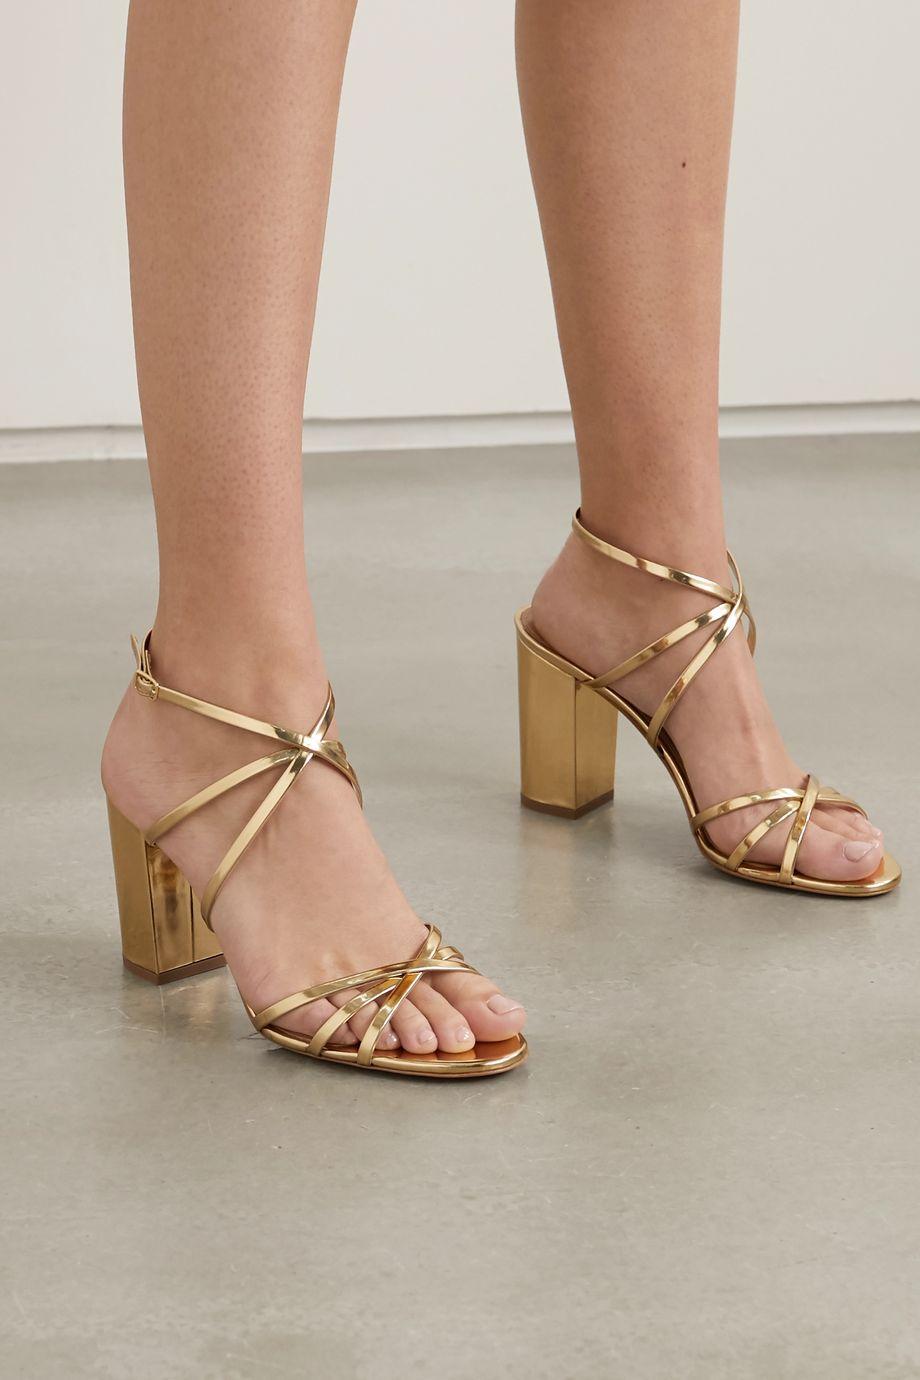 Aquazzura Gin 85 metallic patent-leather sandals